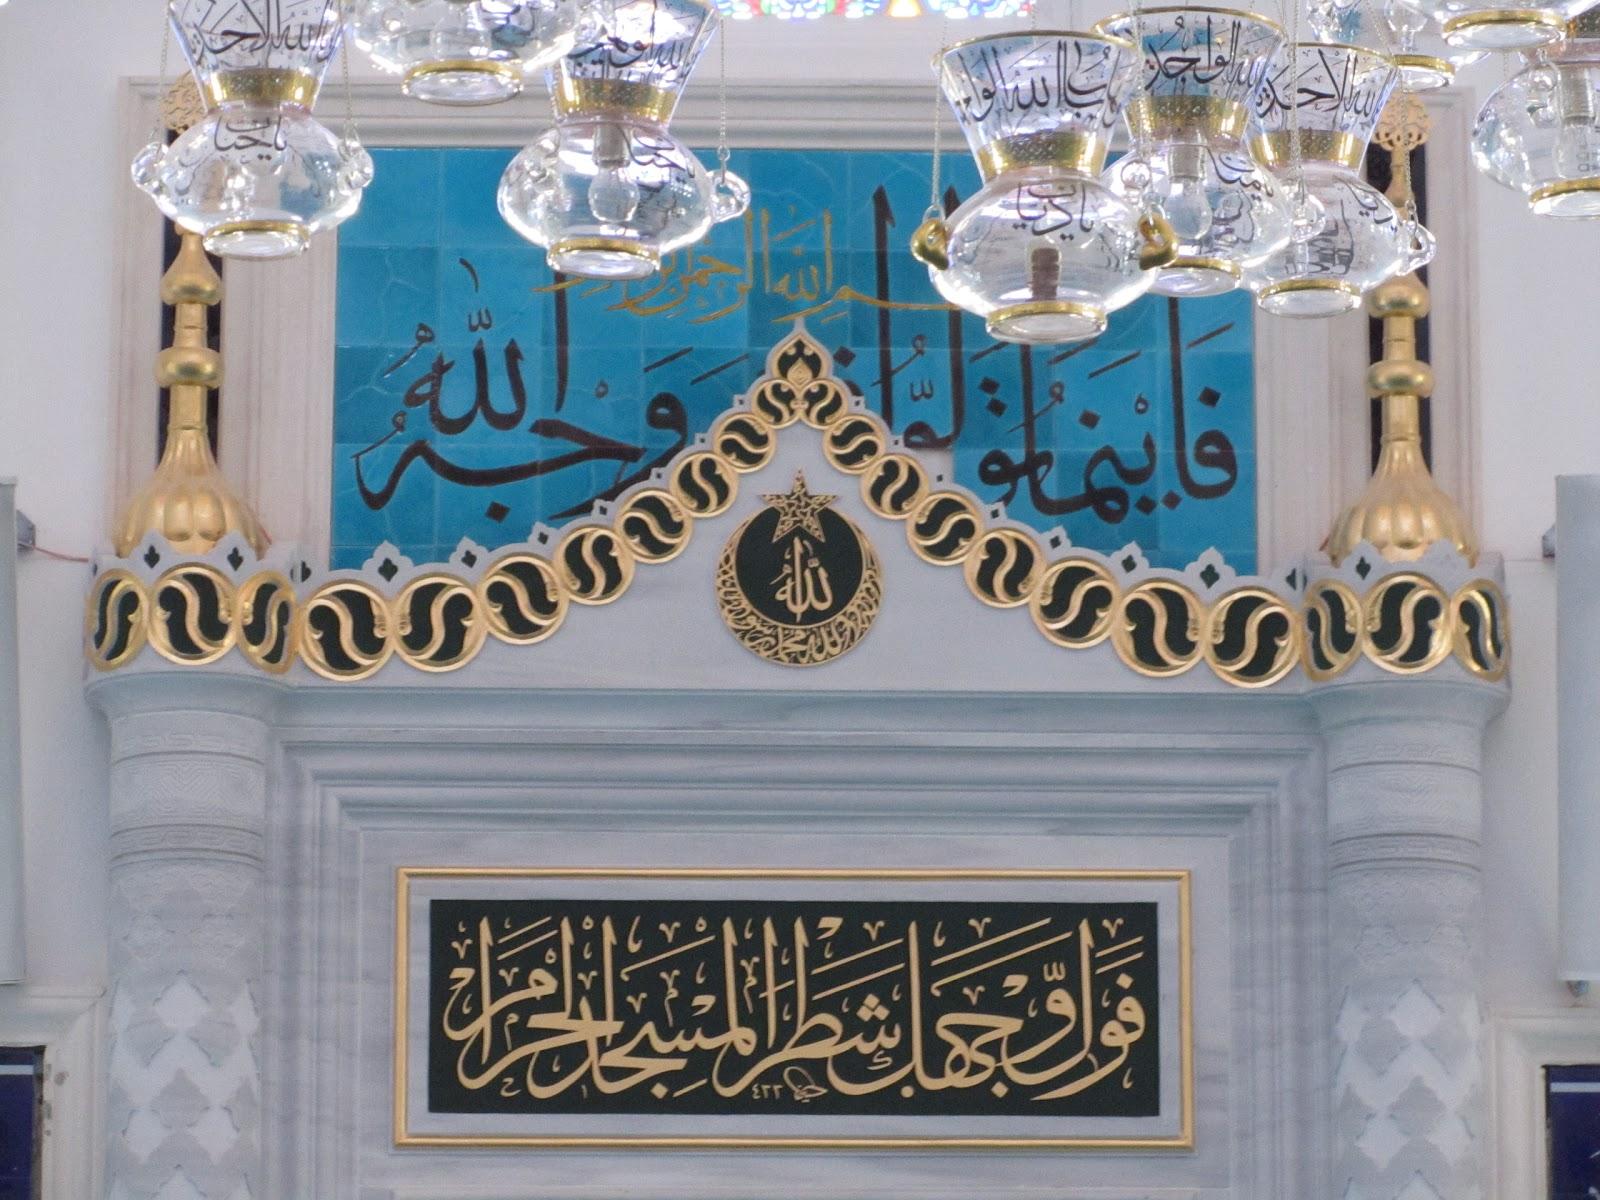 Garibce: Mimar Sinan Camii Mihrap Yaz